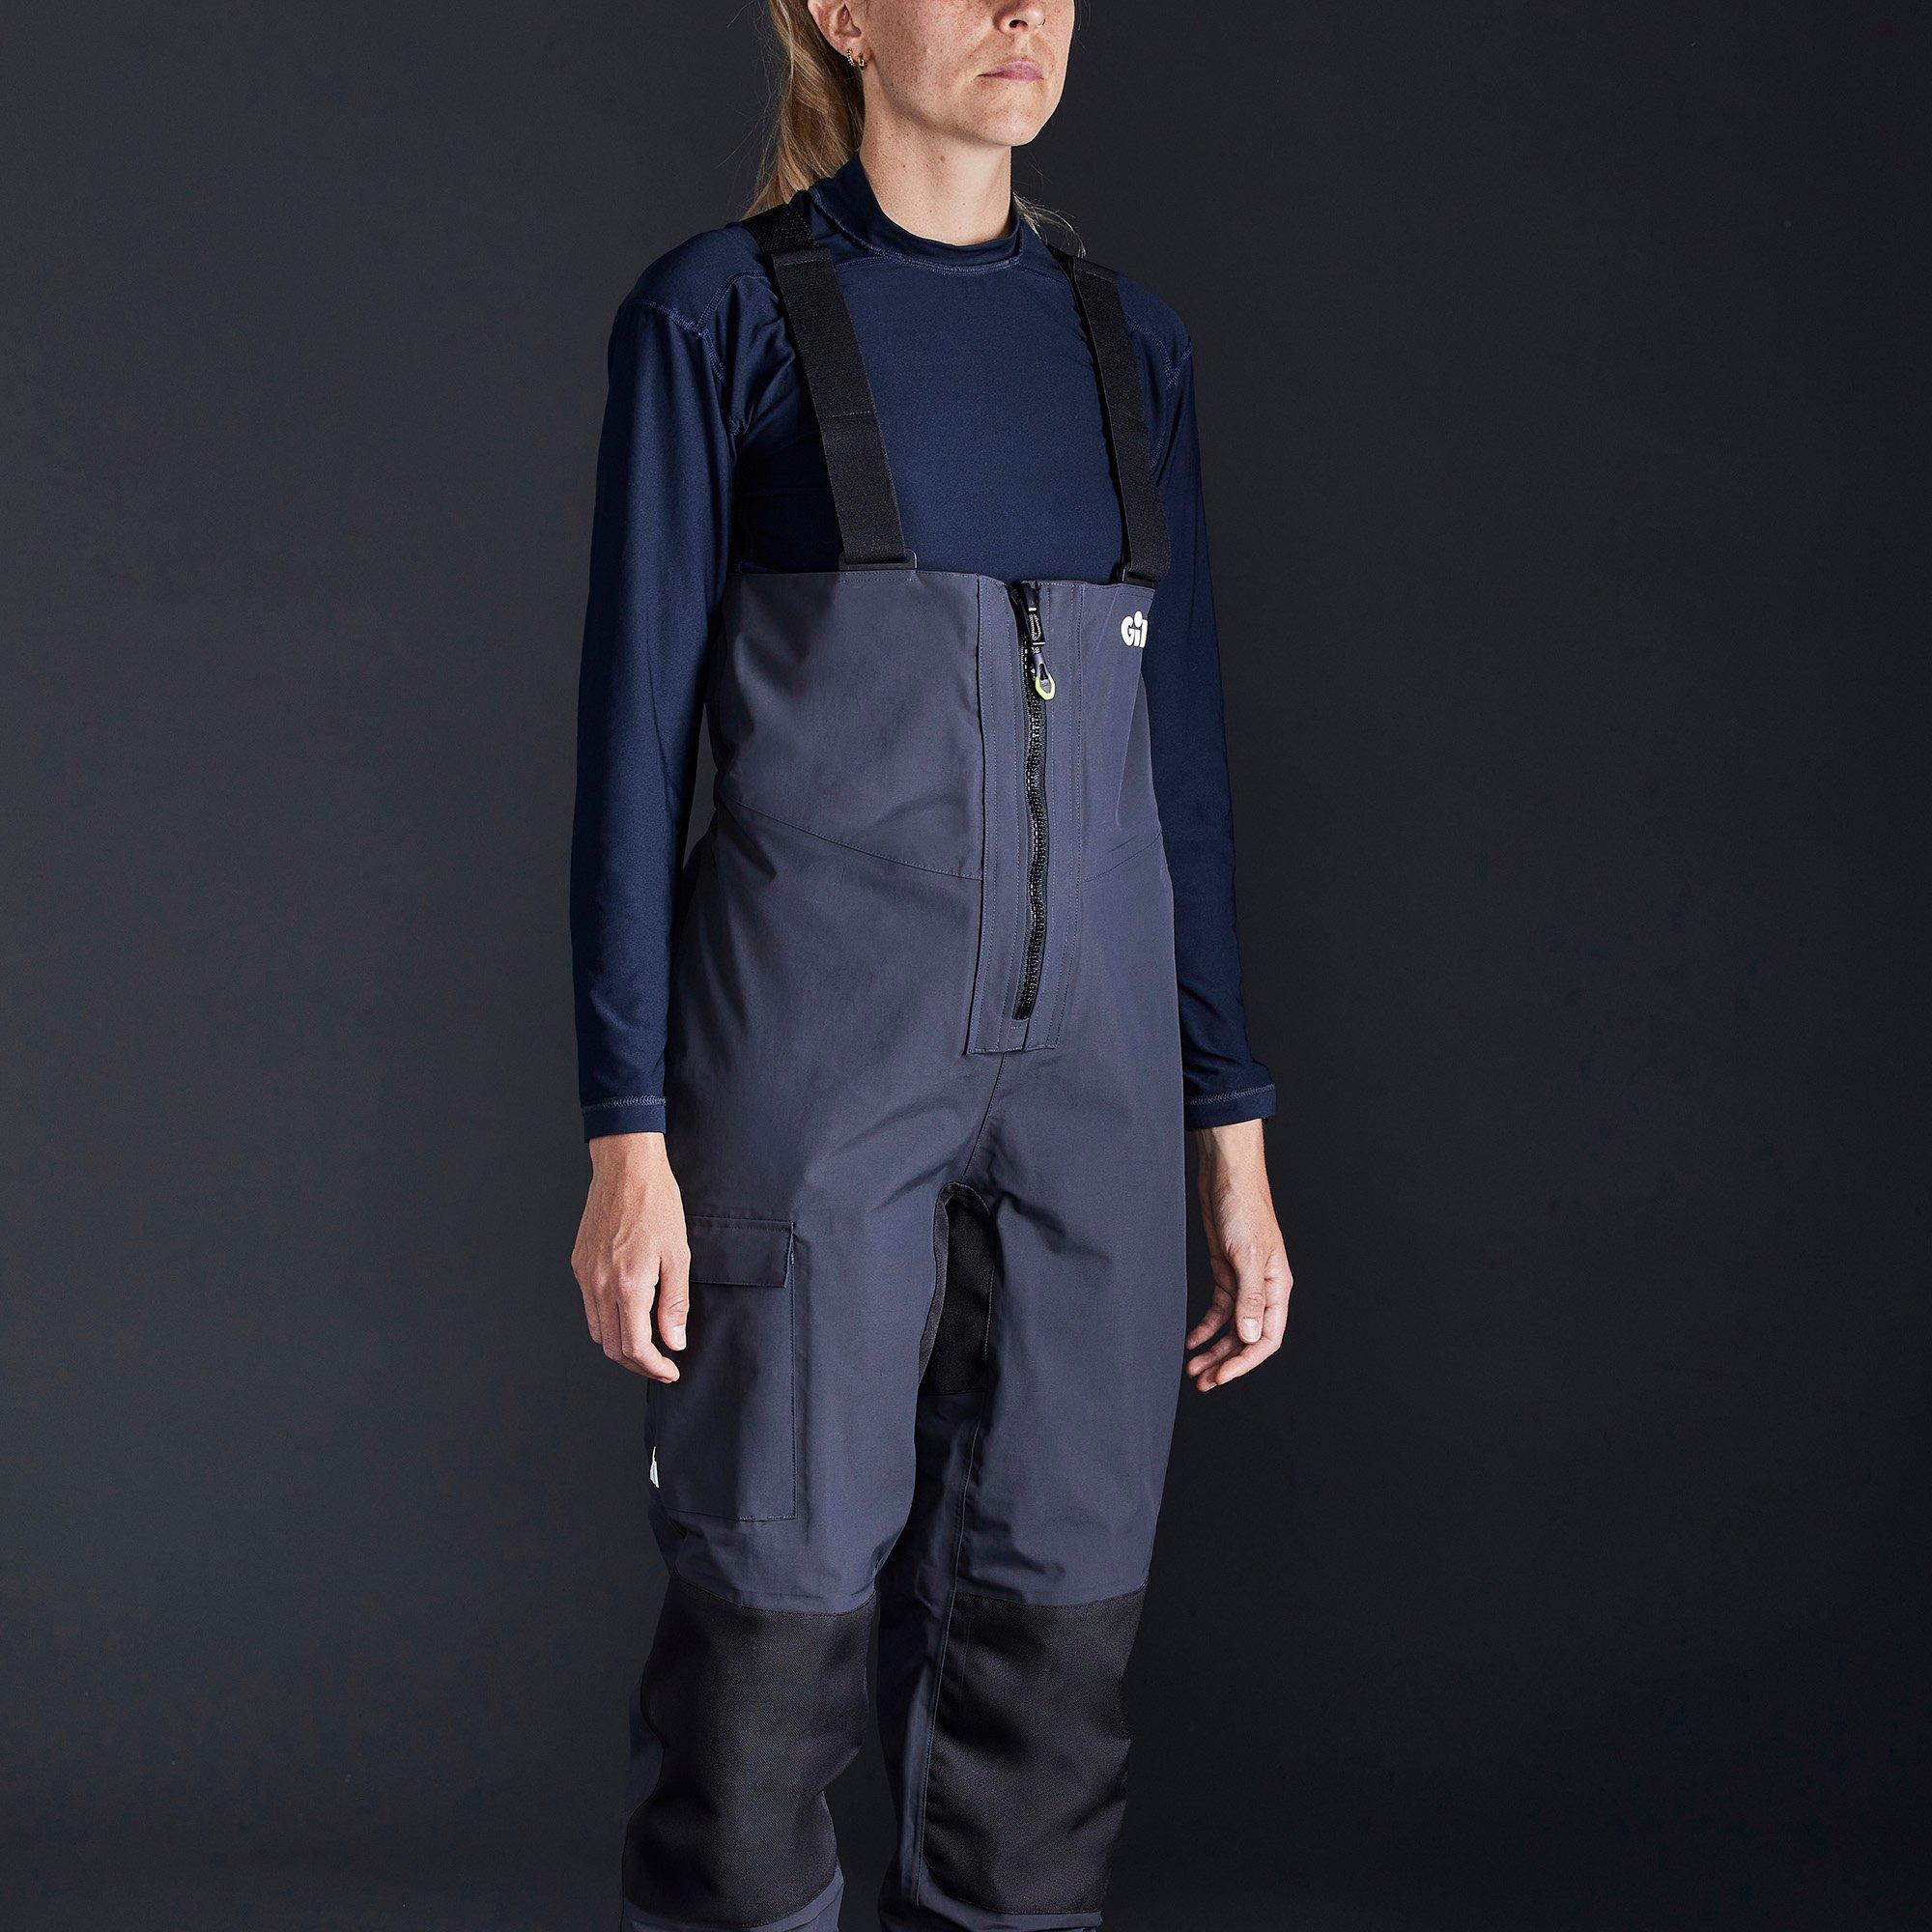 Women's OS3 Coastal Trousers - OS32TW-GRA01-MODEL_2.jpg